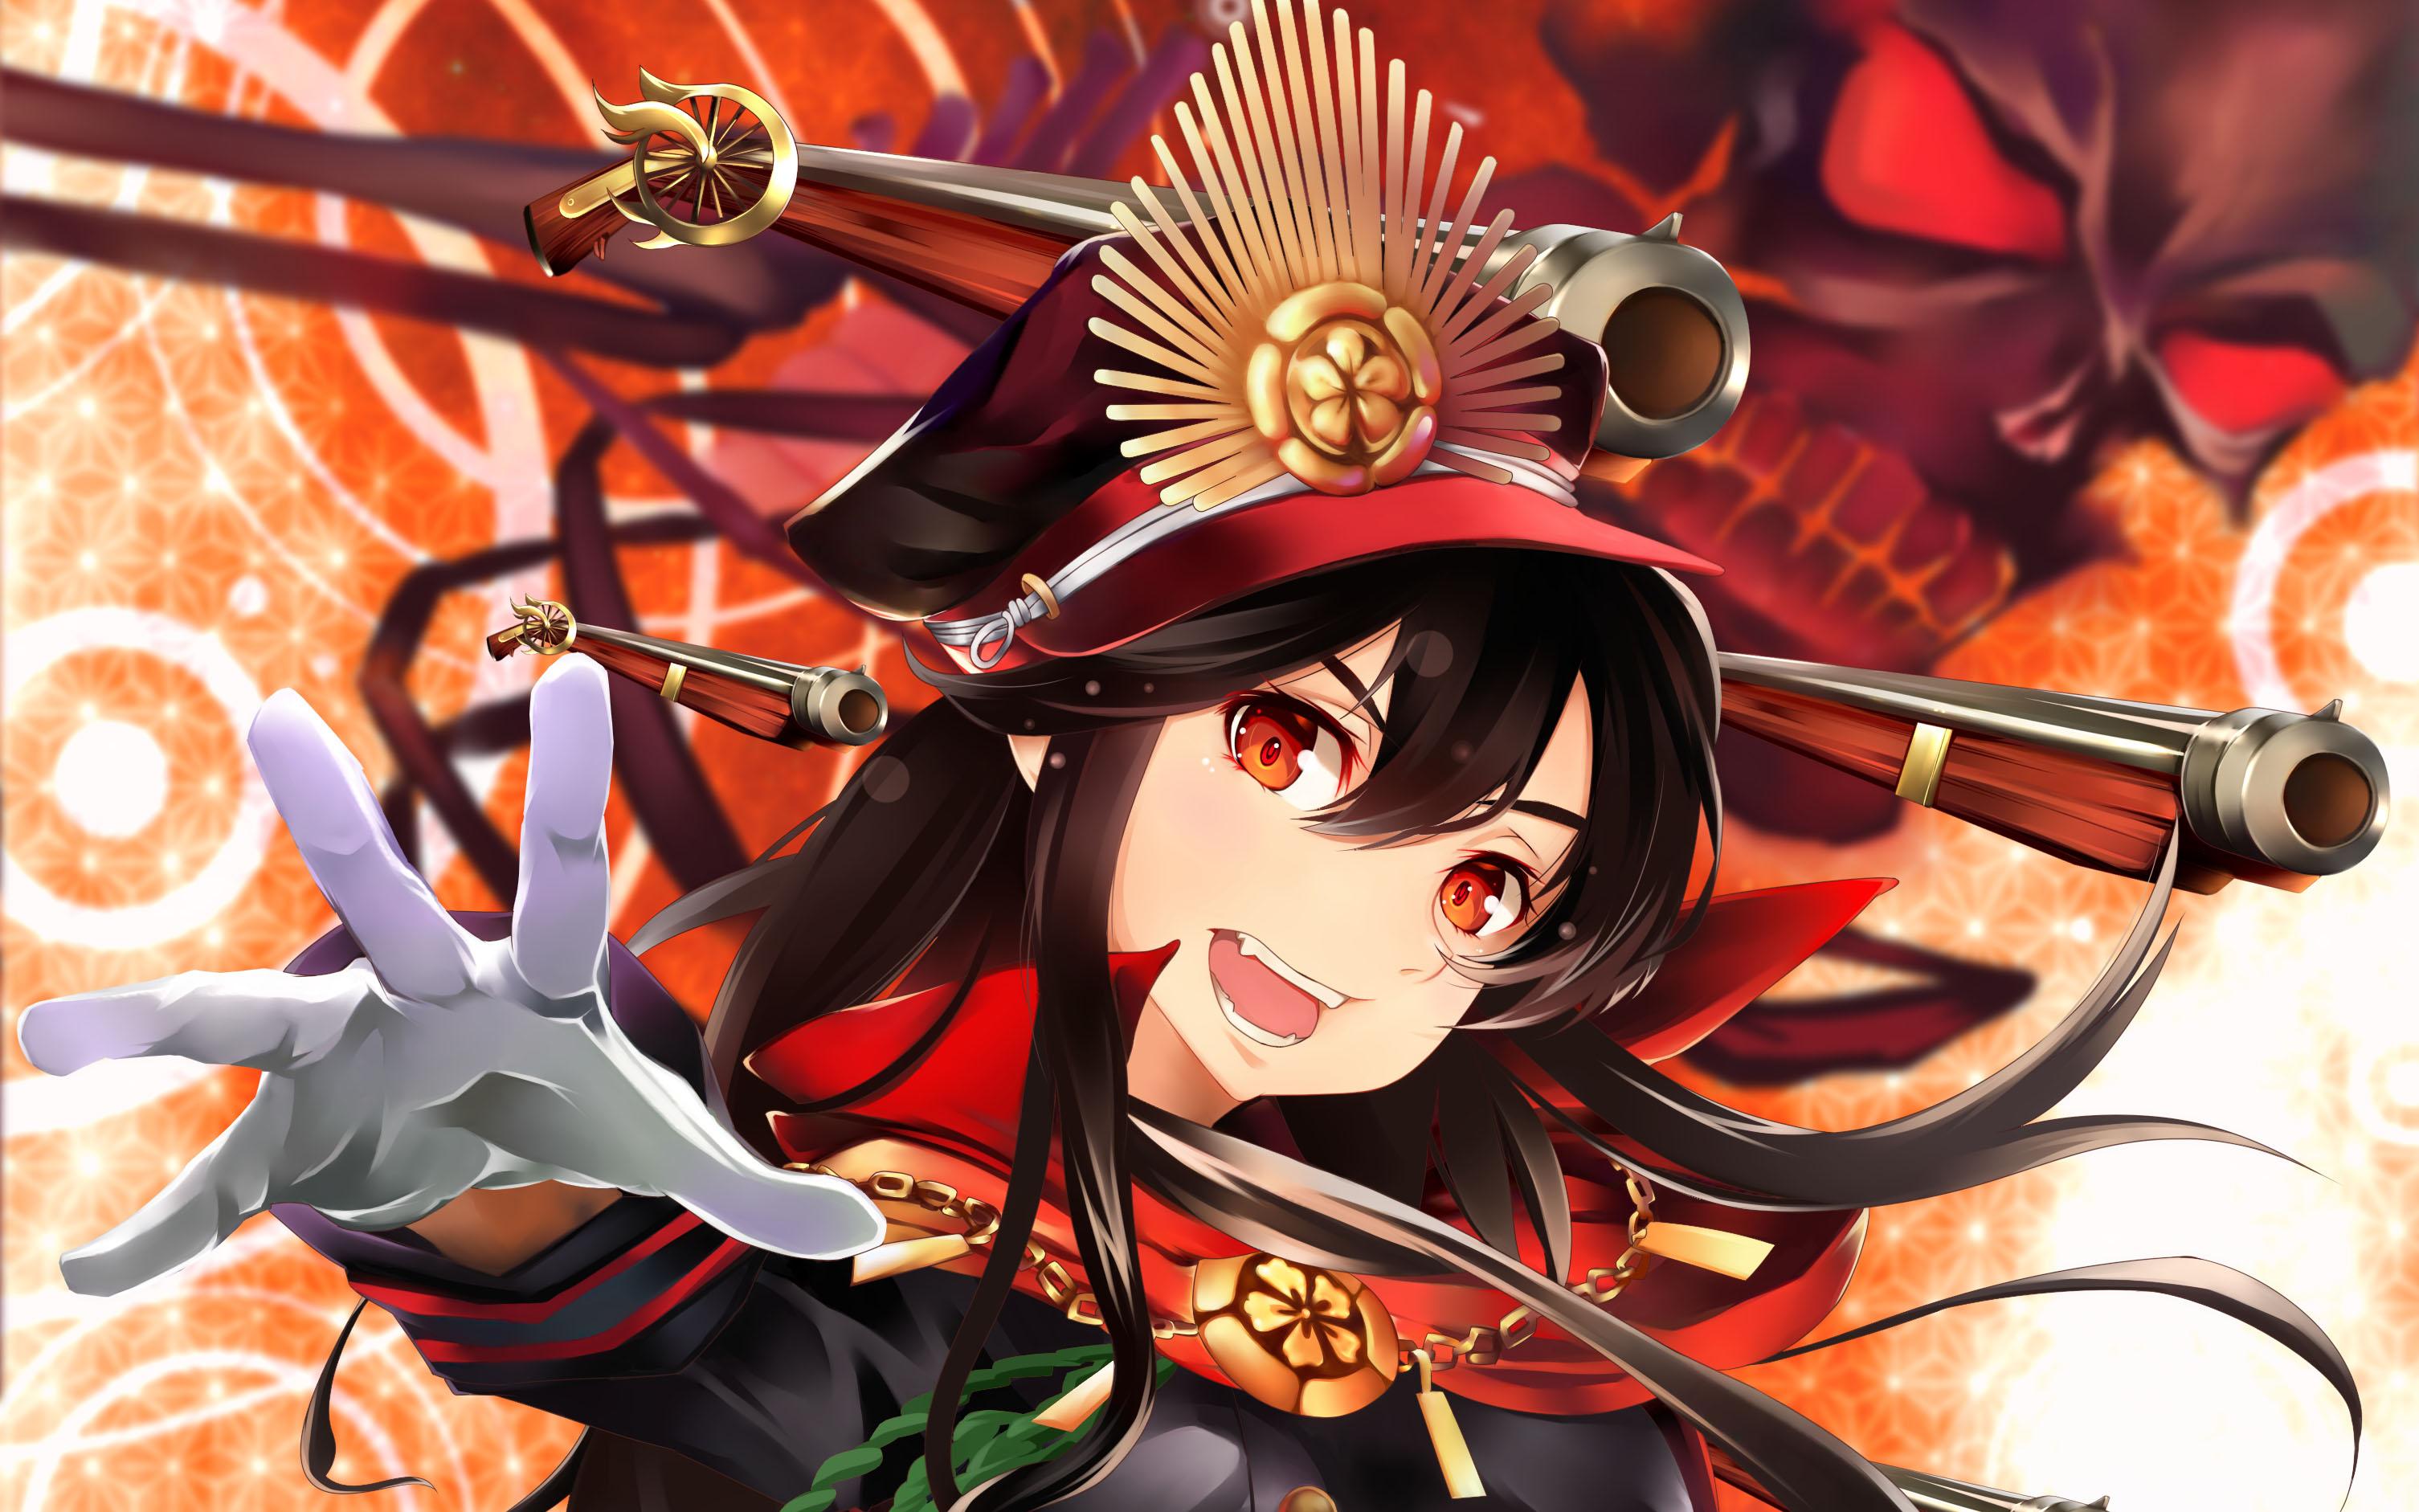 Anime Fate/Grand Order Oda Nobunaga Wallpaper